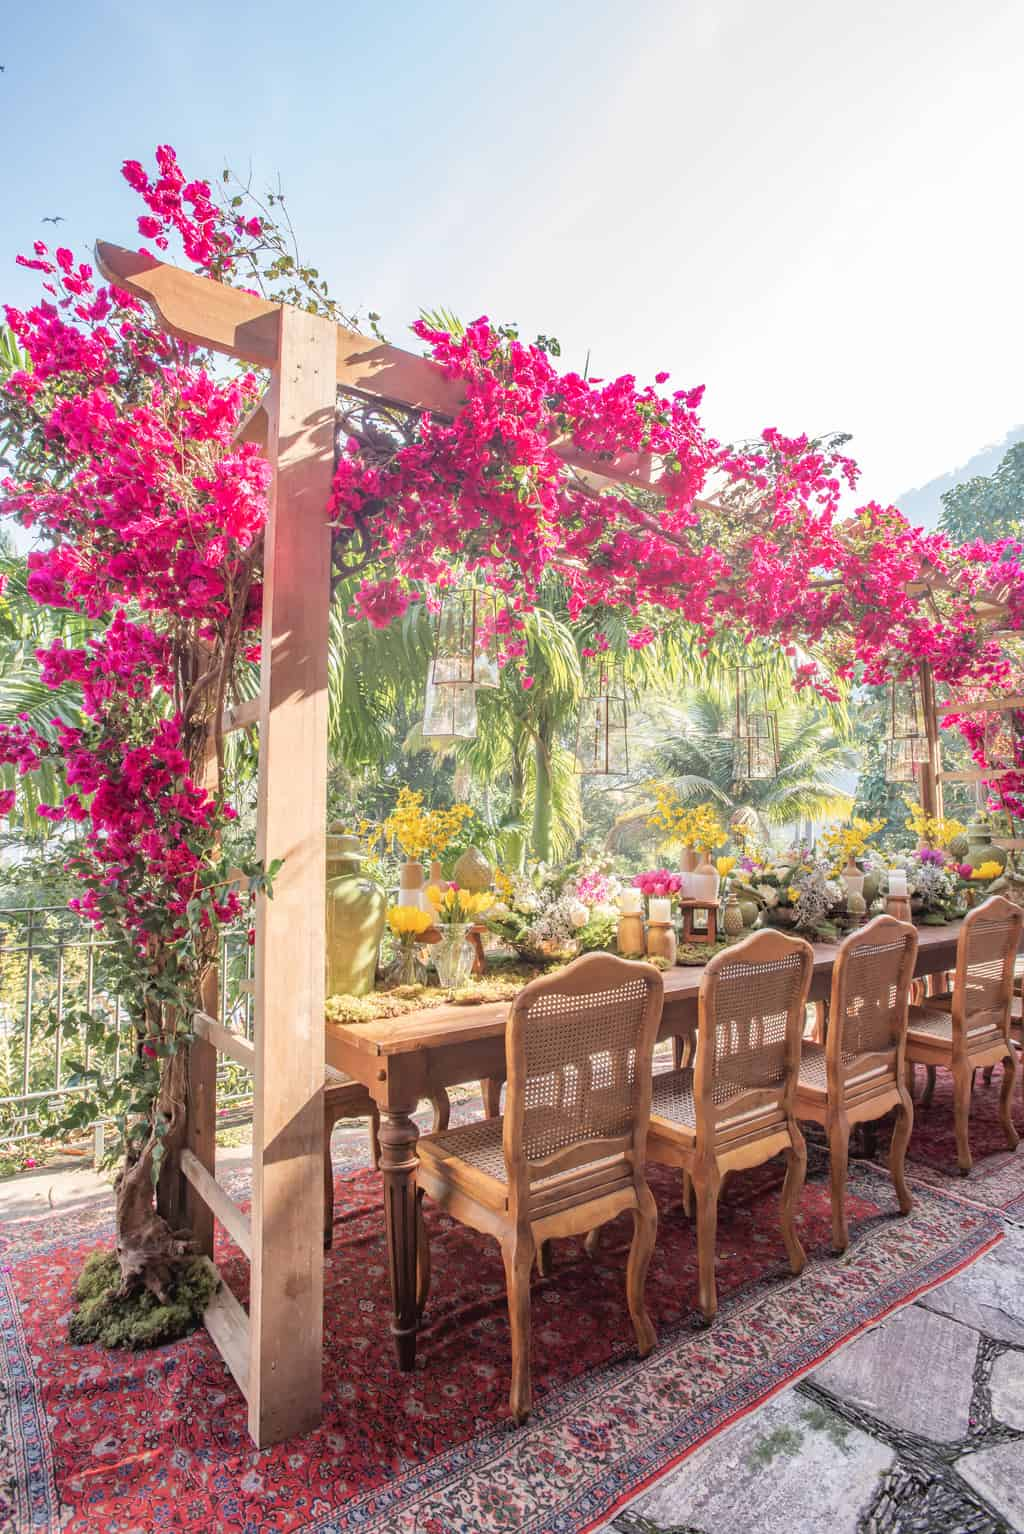 Casamento-Paula-e-Alex-Fotografia-Marina-Fava-Decor-Andrea-Kapps-mesa-de-convidados